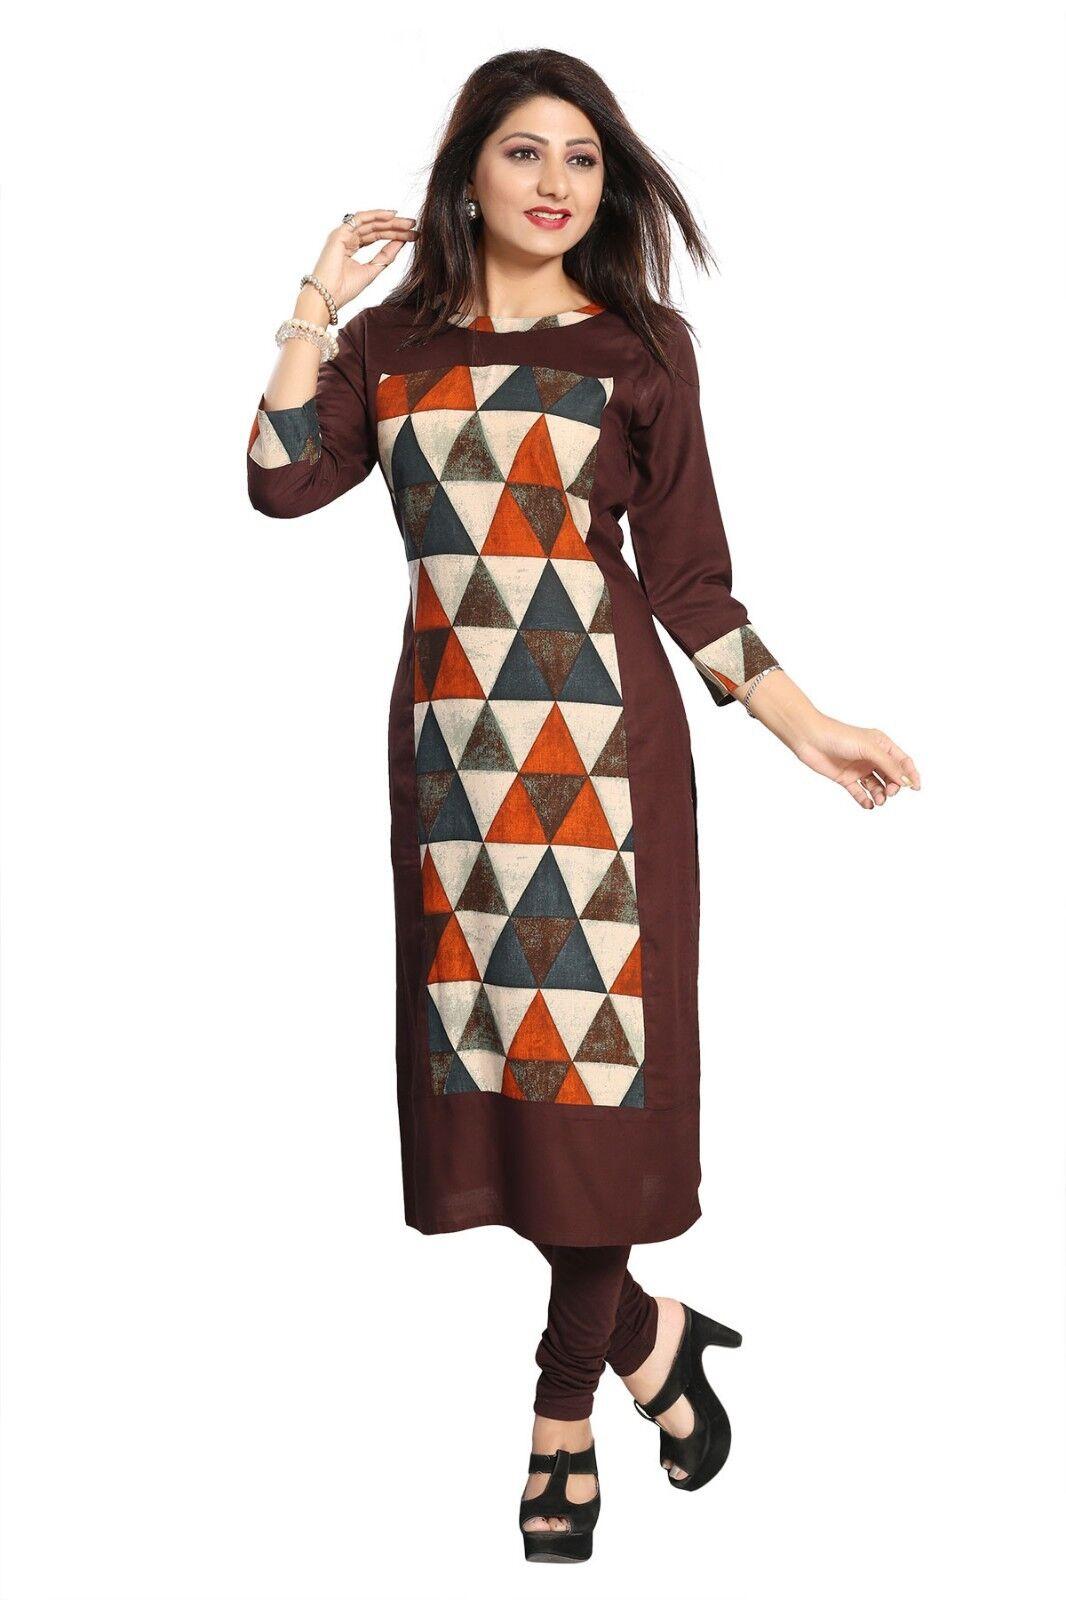 UK-Stock New Gorgeous Long Indian Rayon Embroidered Tunic Kurtis Kurta Tops